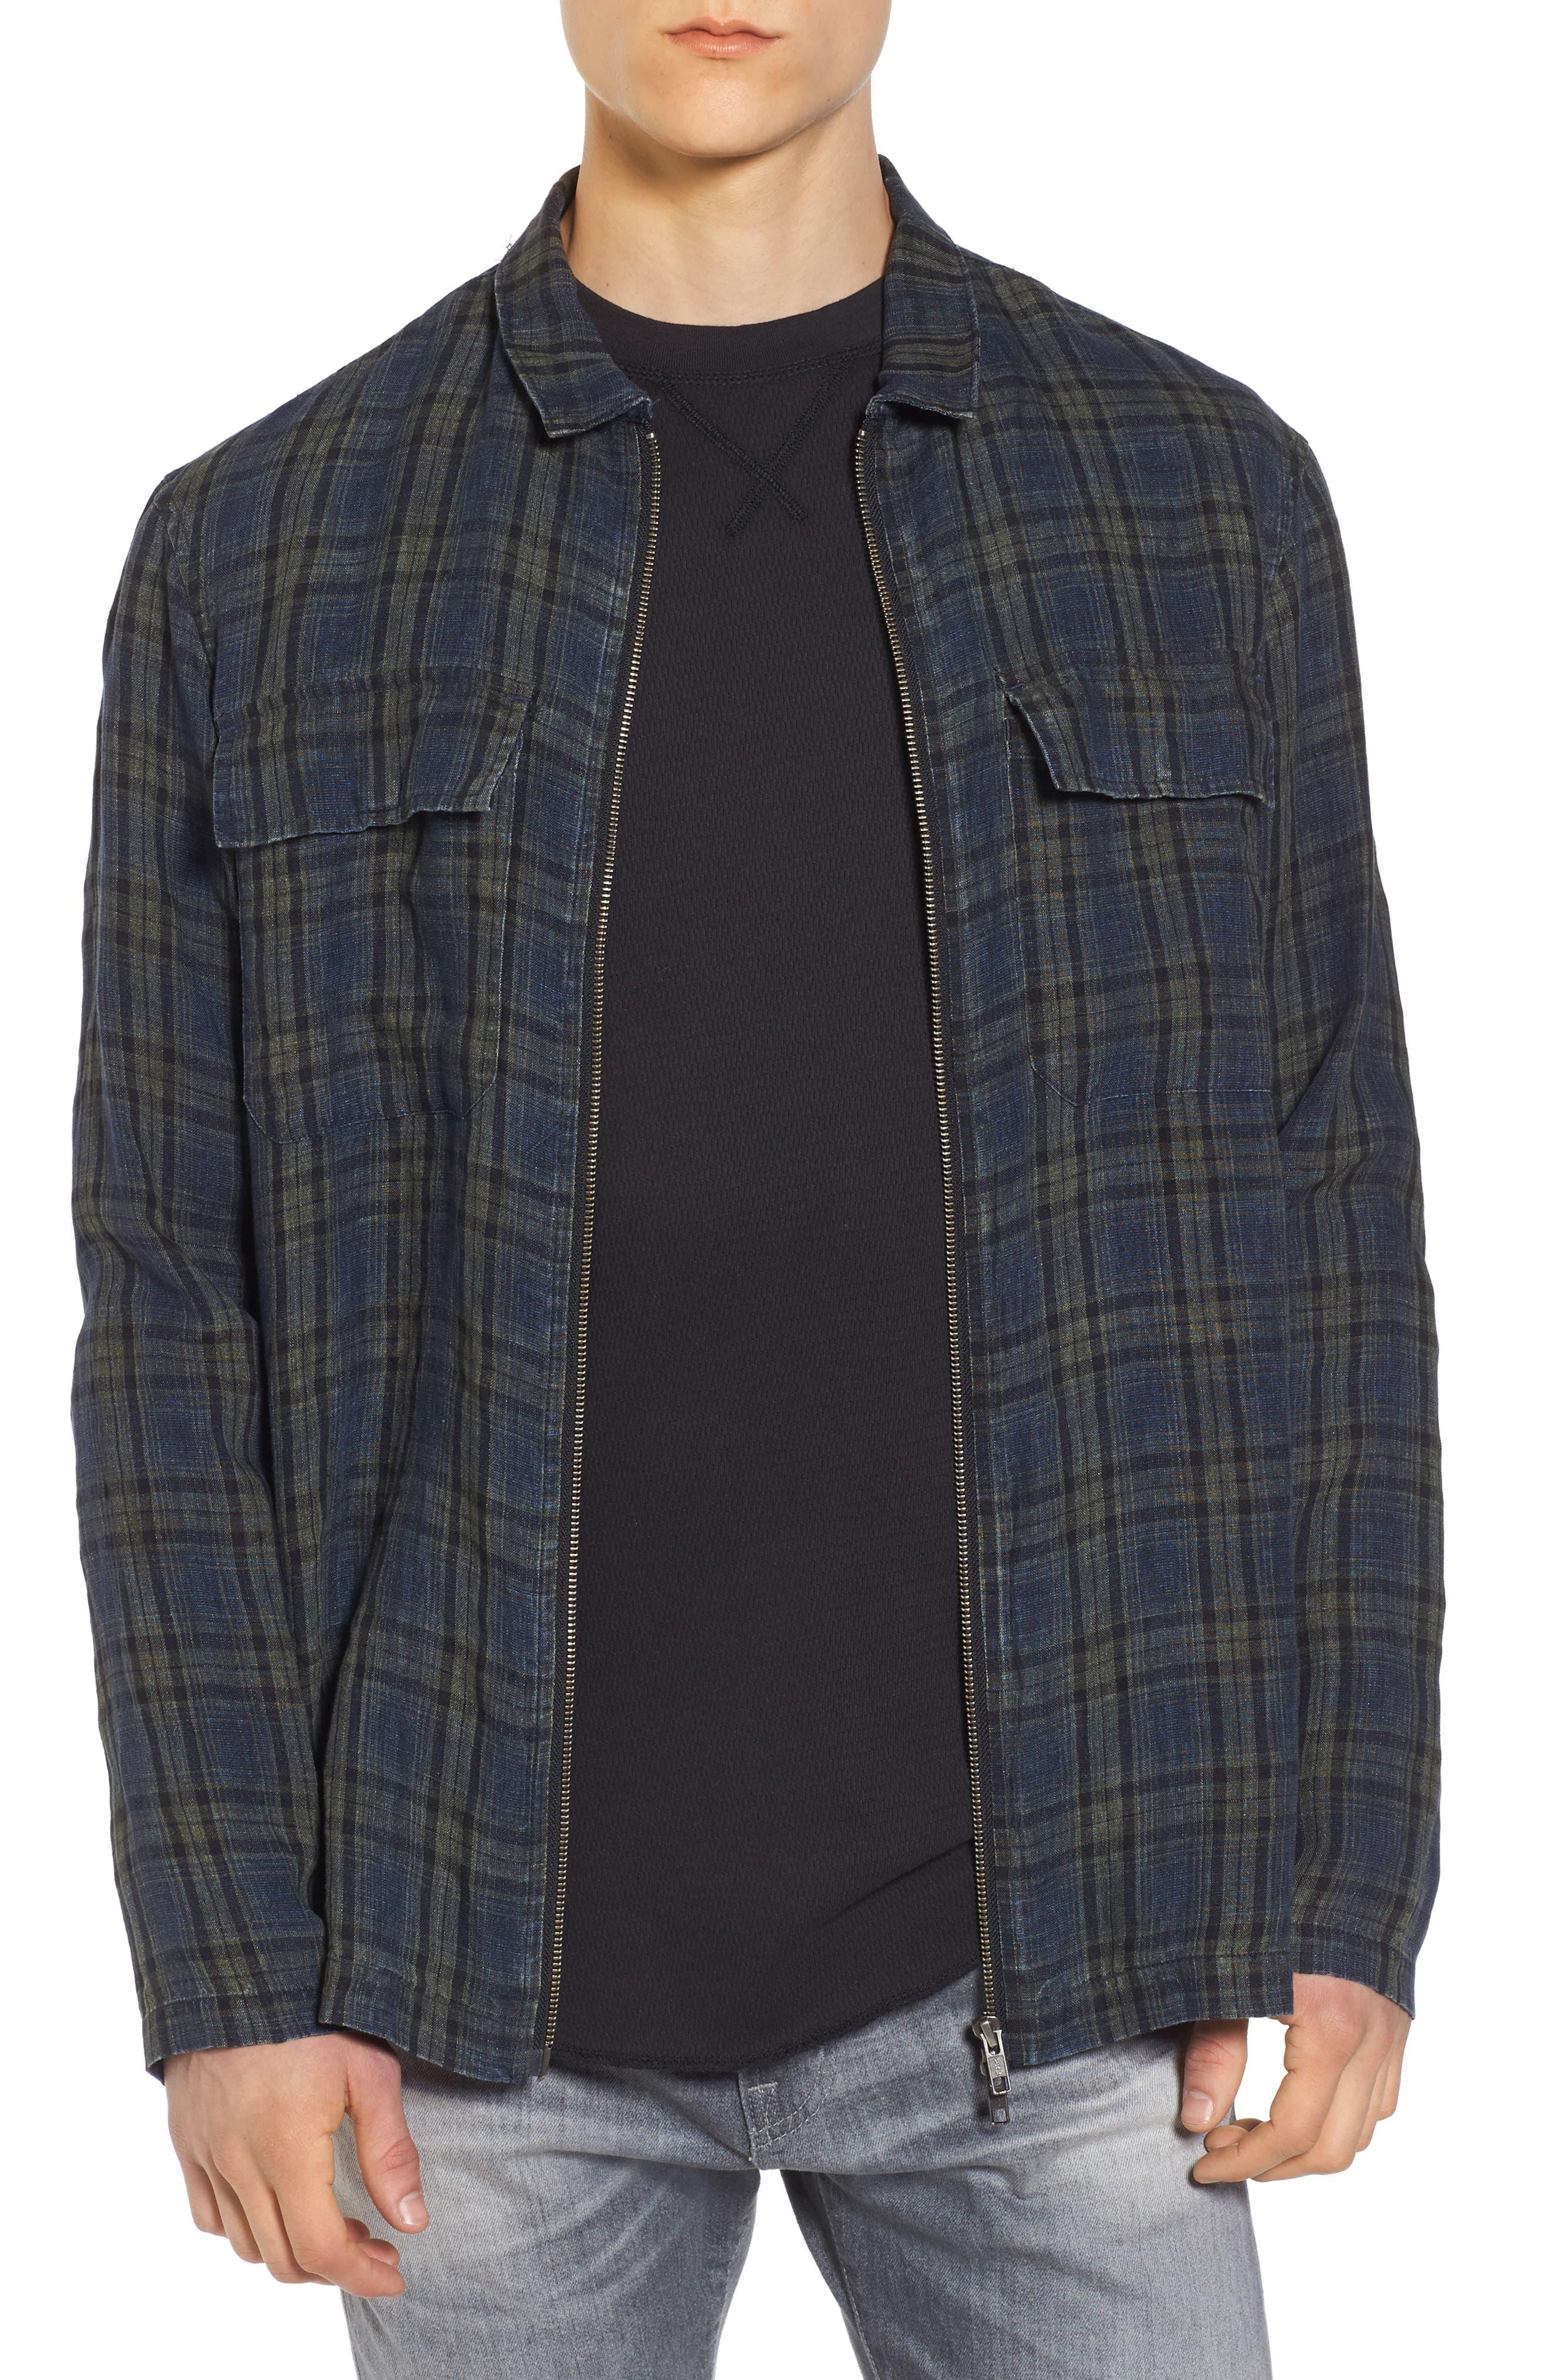 Plaid Zip Front Linen Shirt Jacket,                             Main thumbnail 1, color,                             Olive Grove Navy Plaid